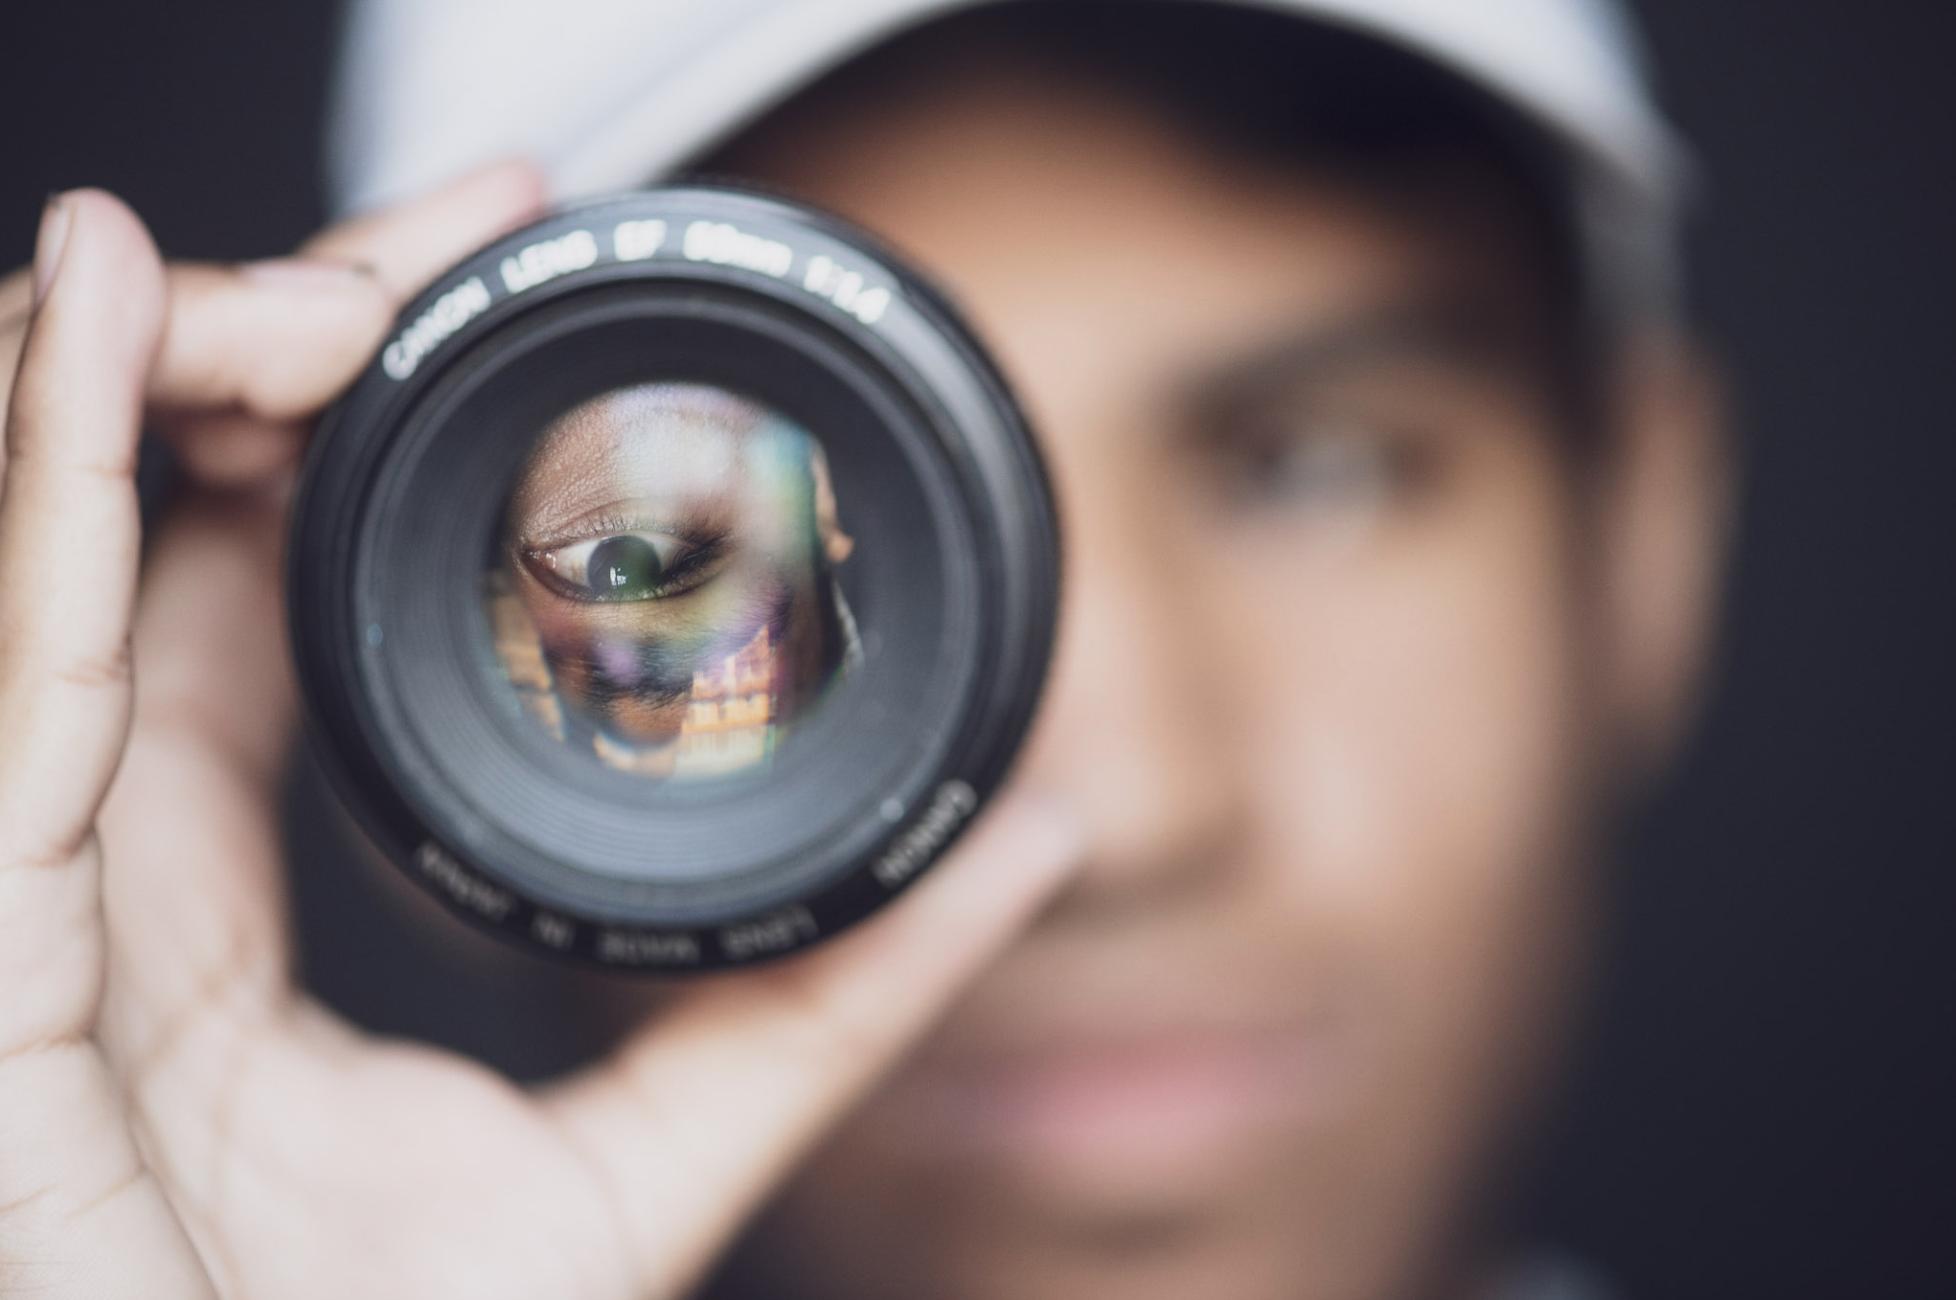 FOTOGRAFISK BILD & DIGITAL RETOUCH